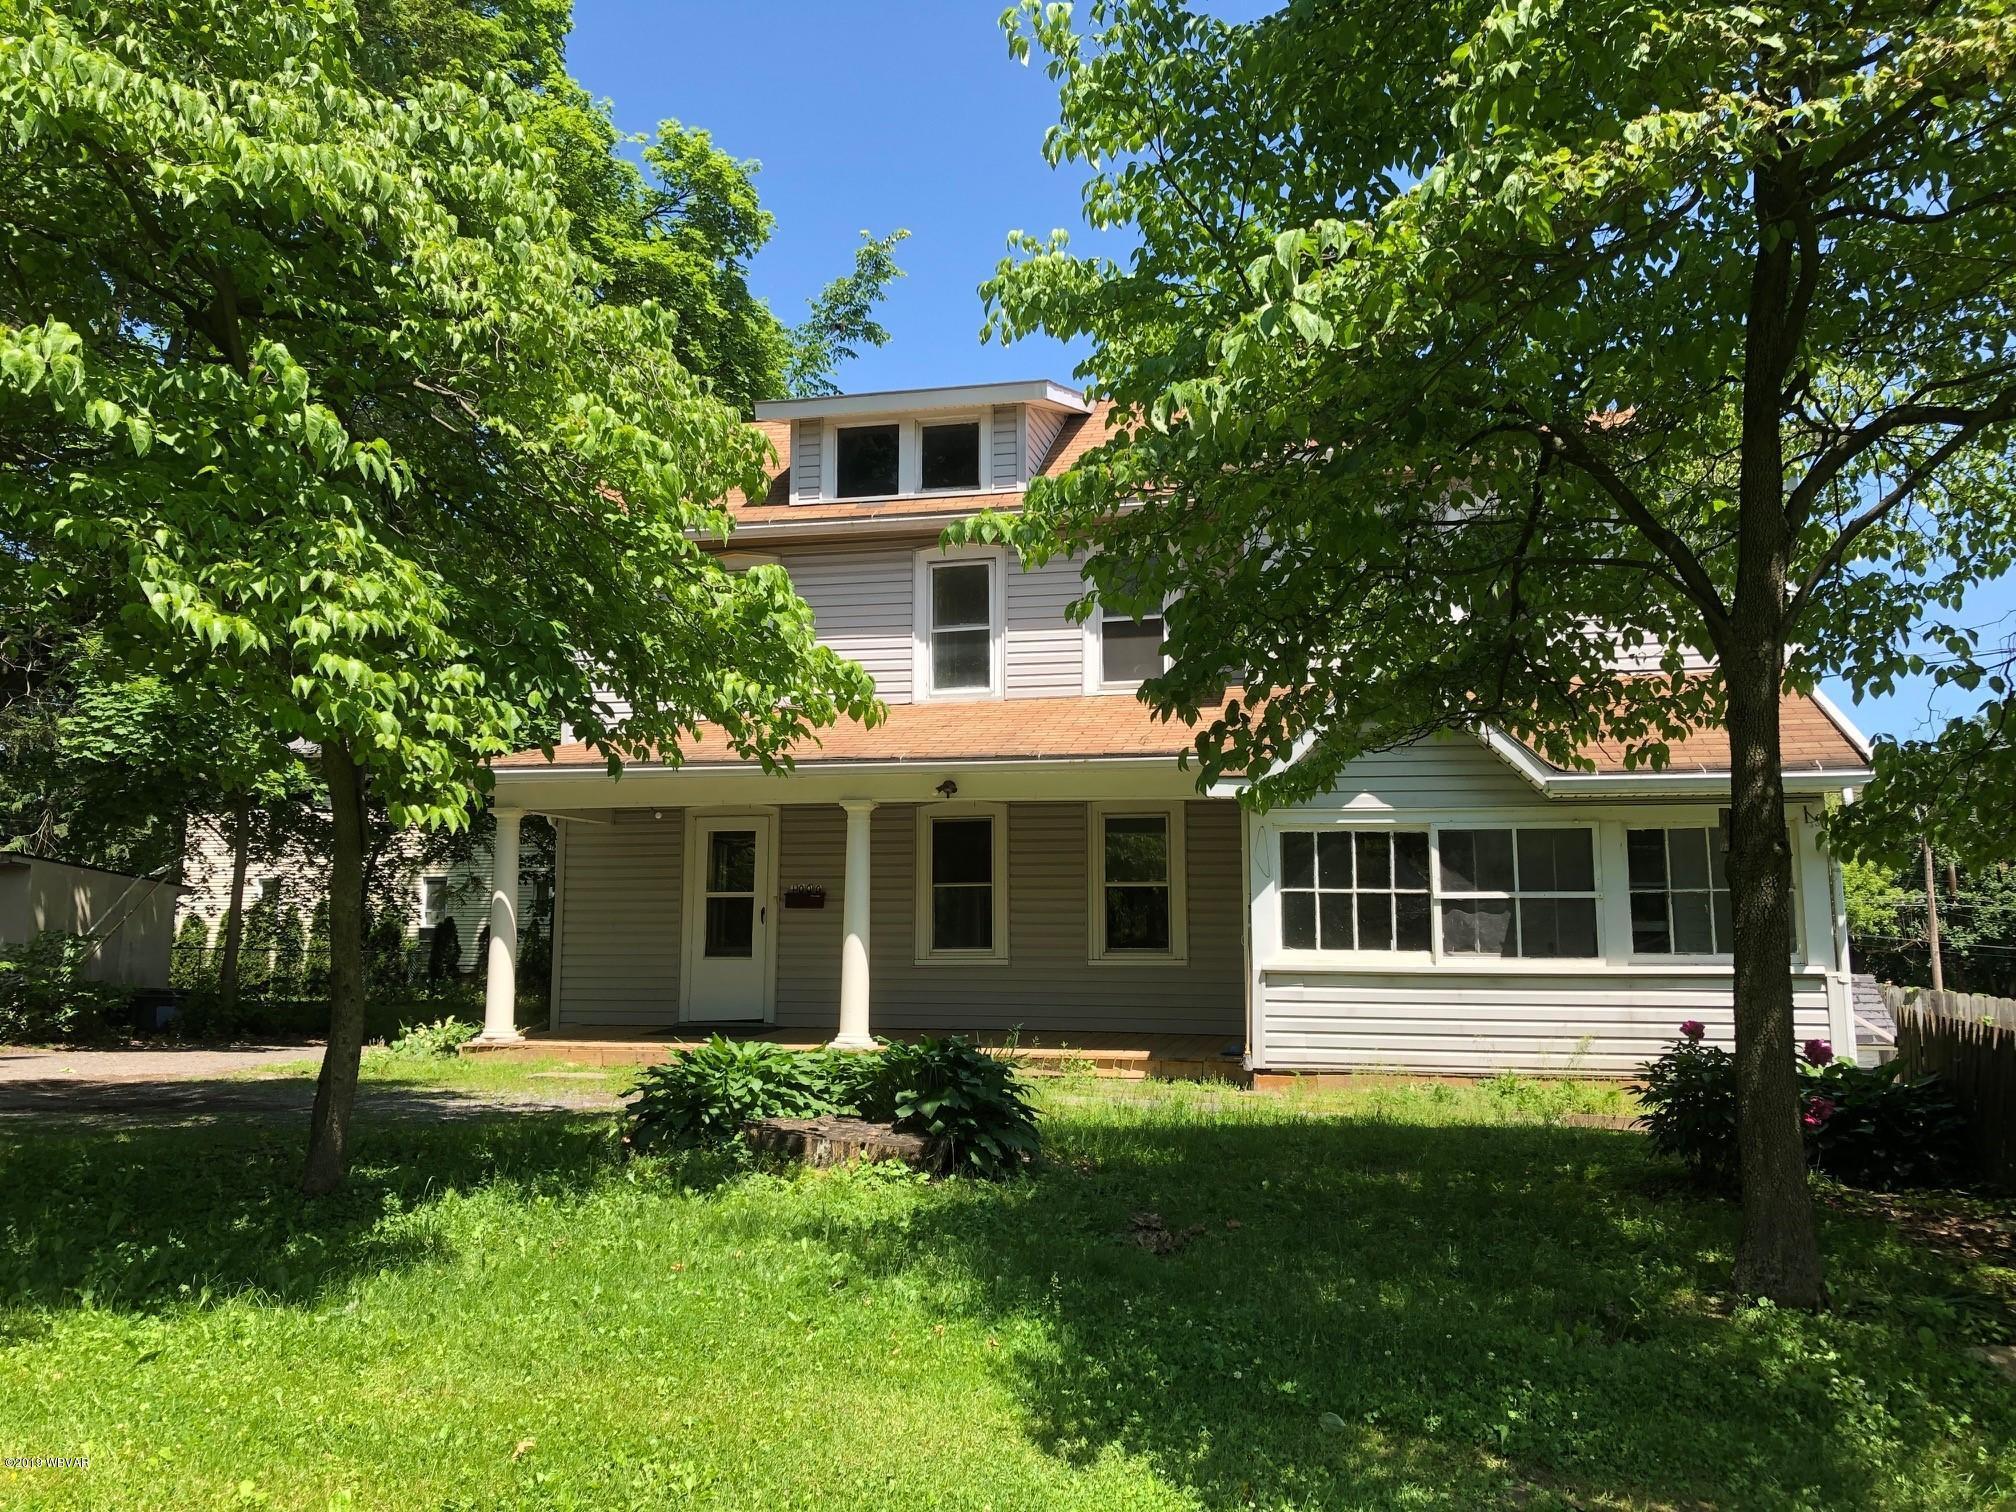 1000 CALVERT AVENUE,Williamsport,PA 17701,3 Bedrooms Bedrooms,1.5 BathroomsBathrooms,Residential,CALVERT,WB-87564